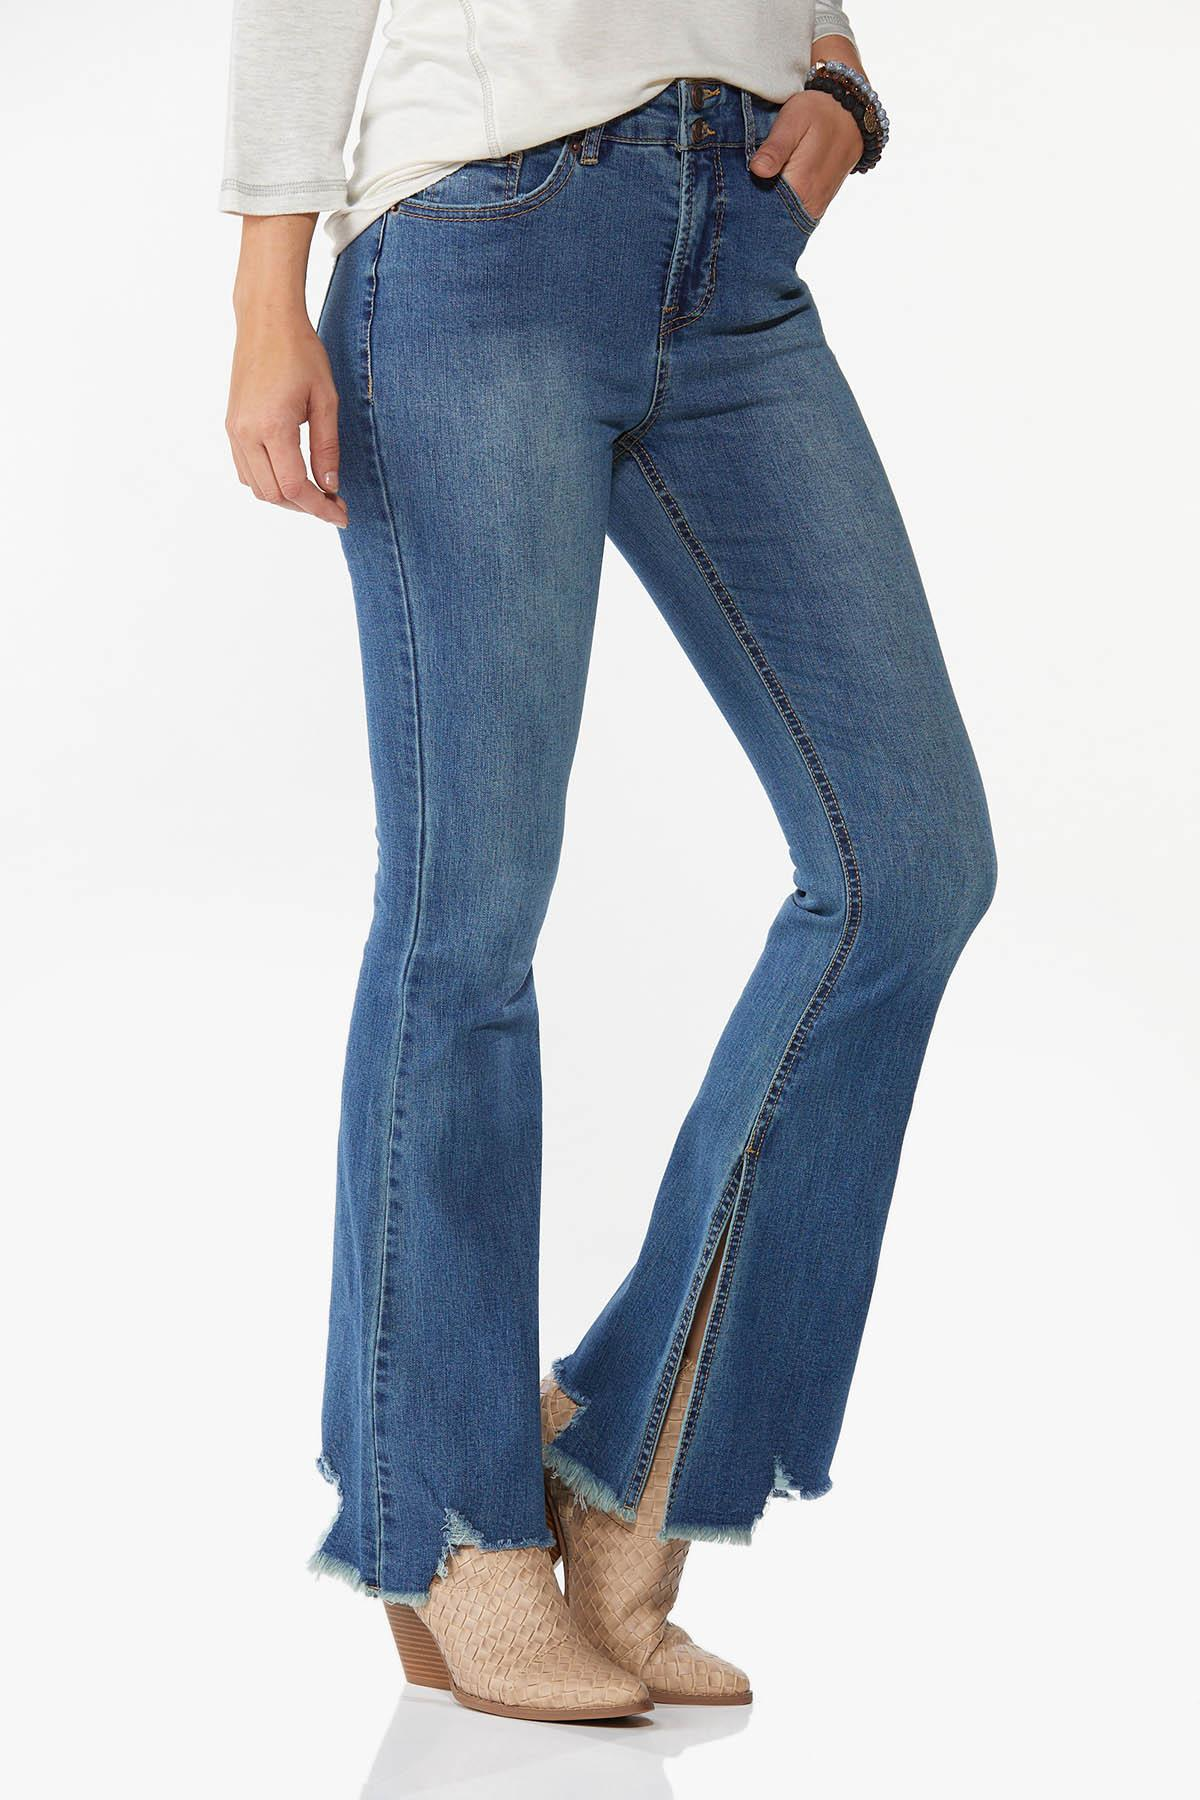 Jagged Hem Flare Jeans (Item #44668251)